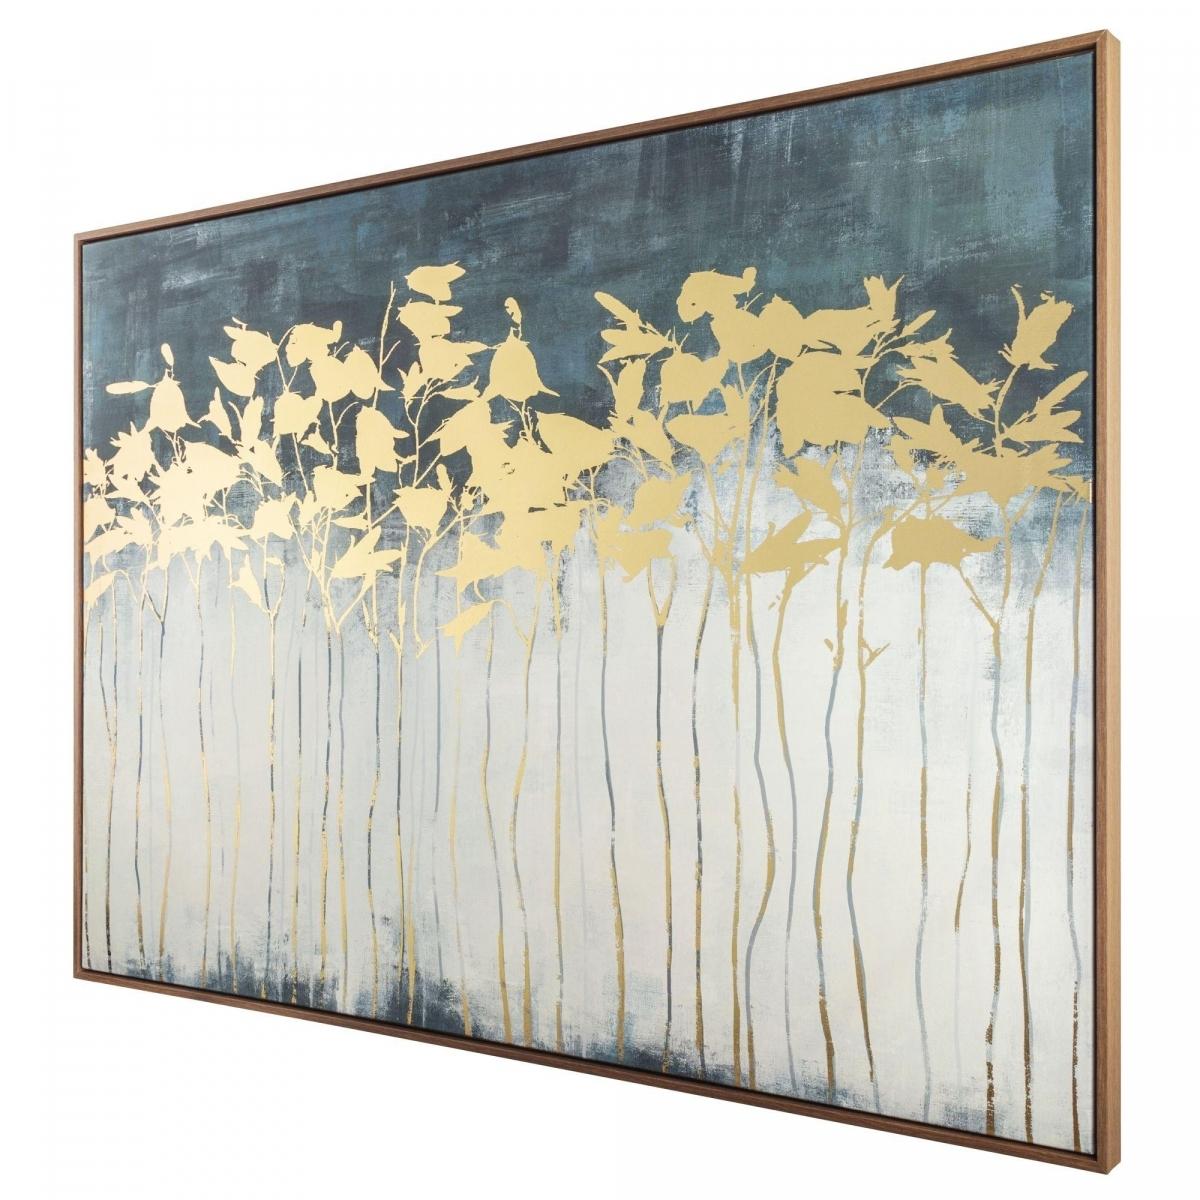 Декоративное интерьерное панно Tomas Stern 87040